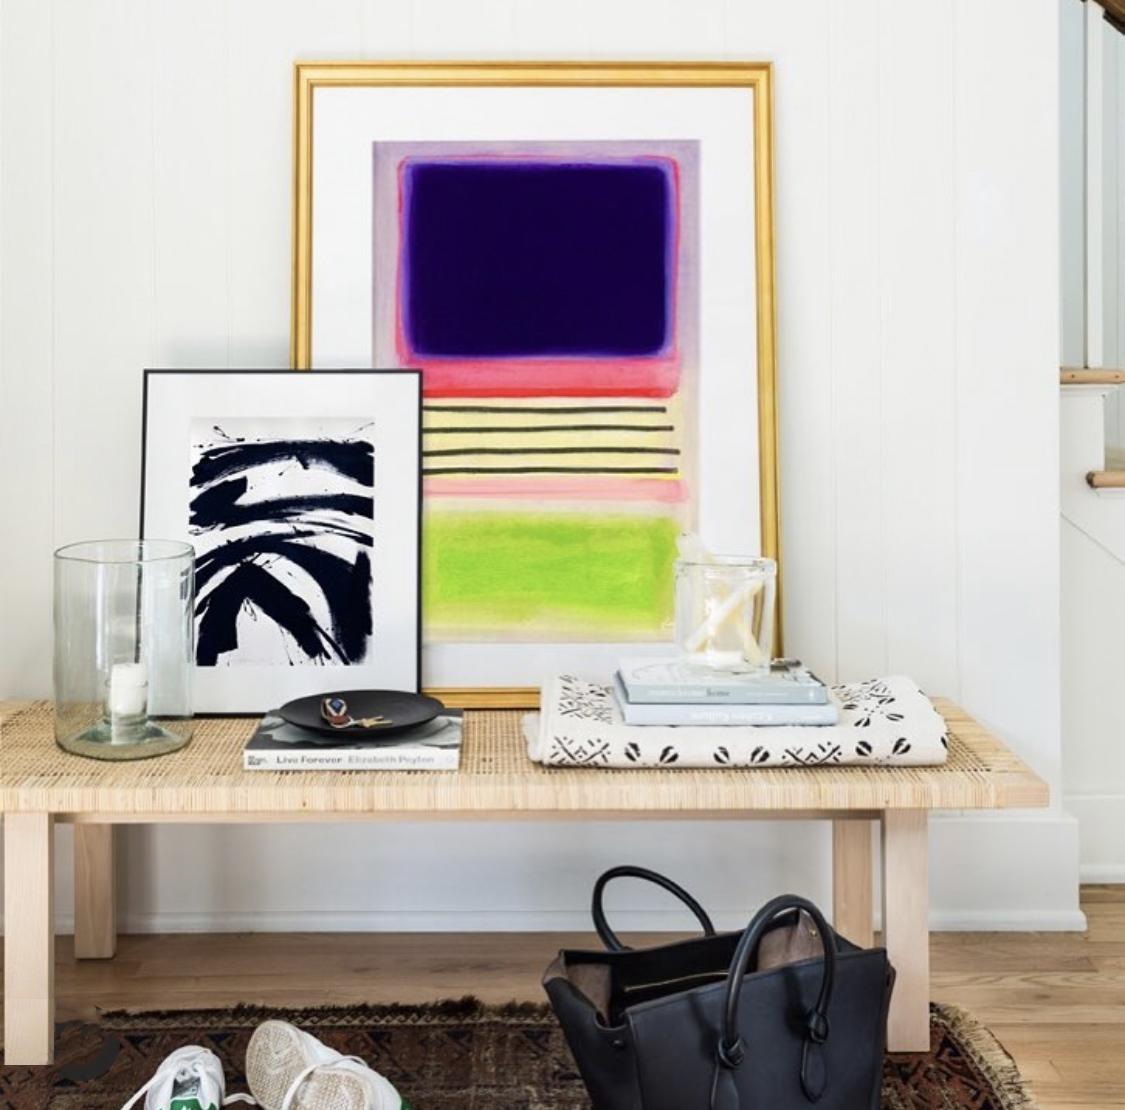 Kristi-Kohut-fine-art-in-homes-collector-reviews650.jpg